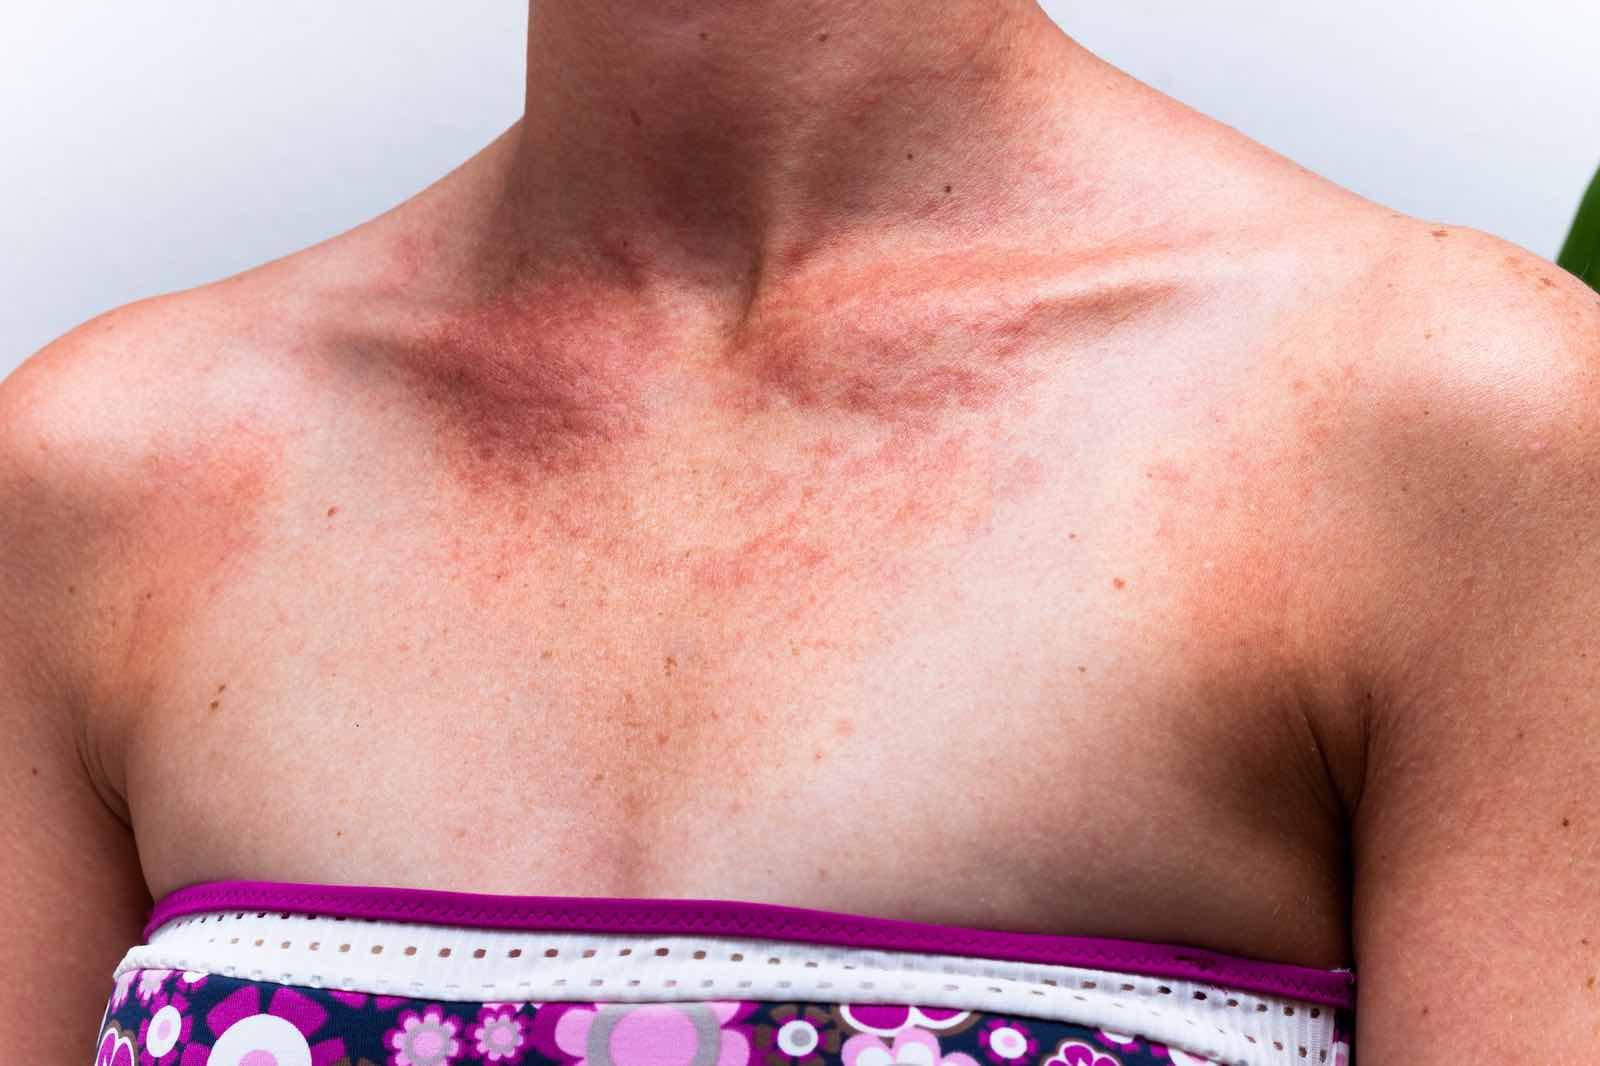 Sunscreen allergy